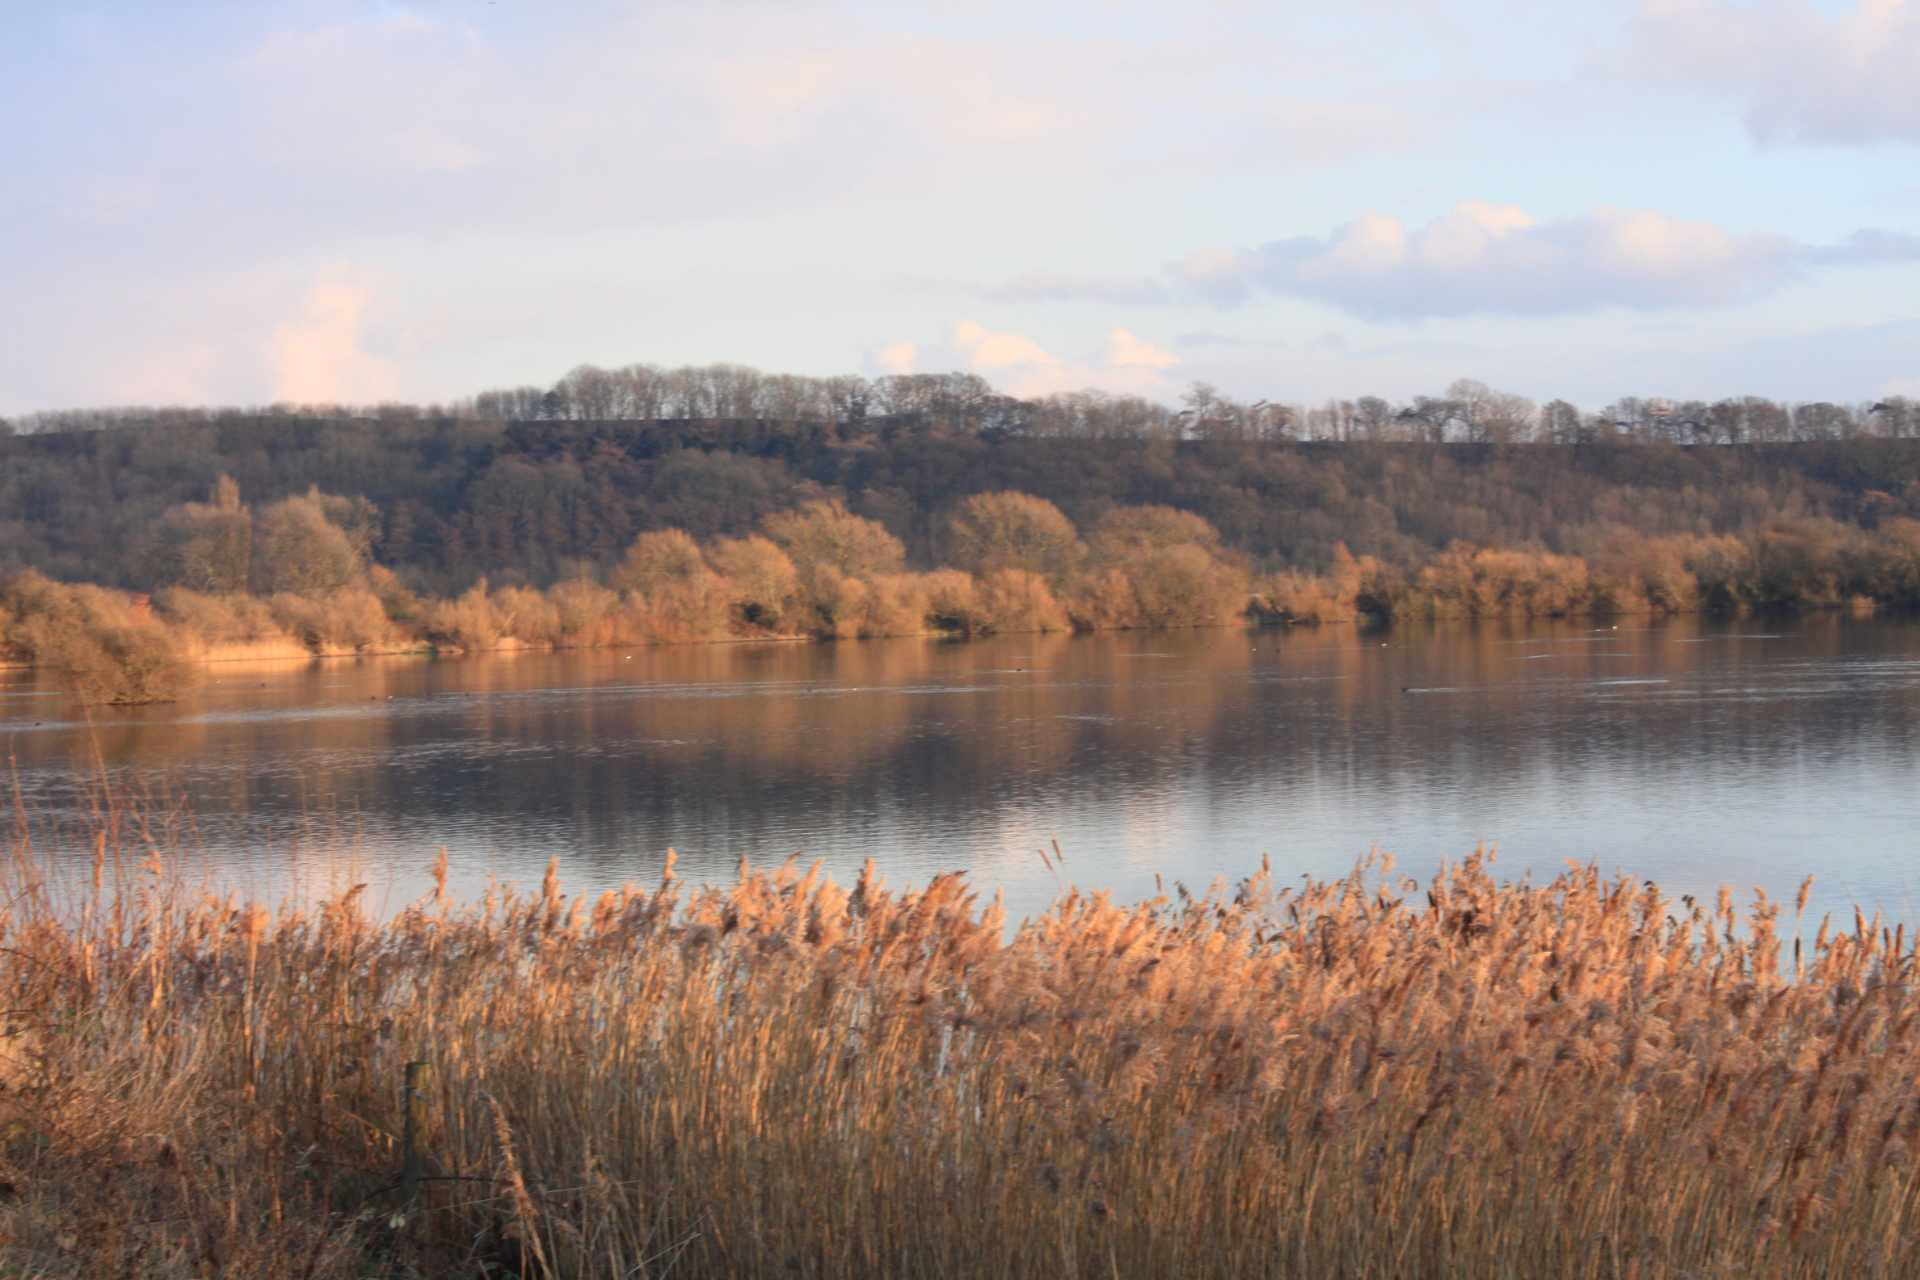 sunset-on-lake-at-attenborough-nature-reserve